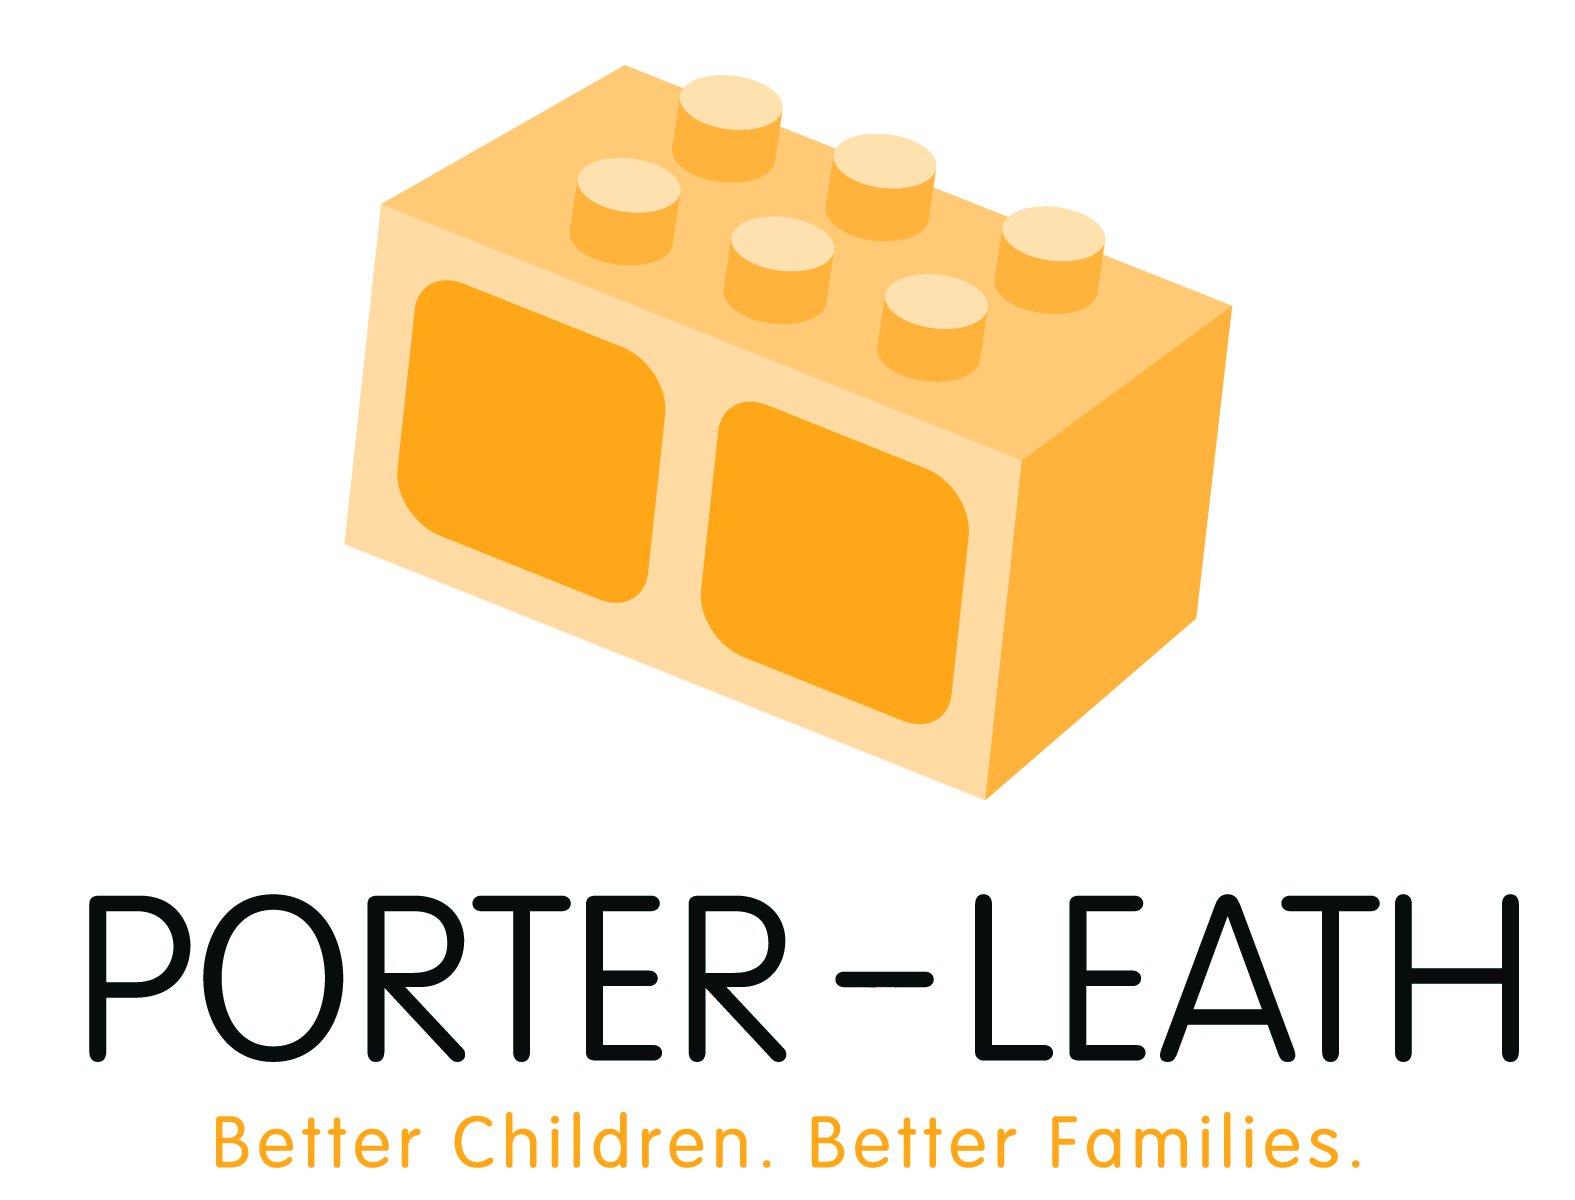 Porter Leath Job Amp Career News From The Memphis Public